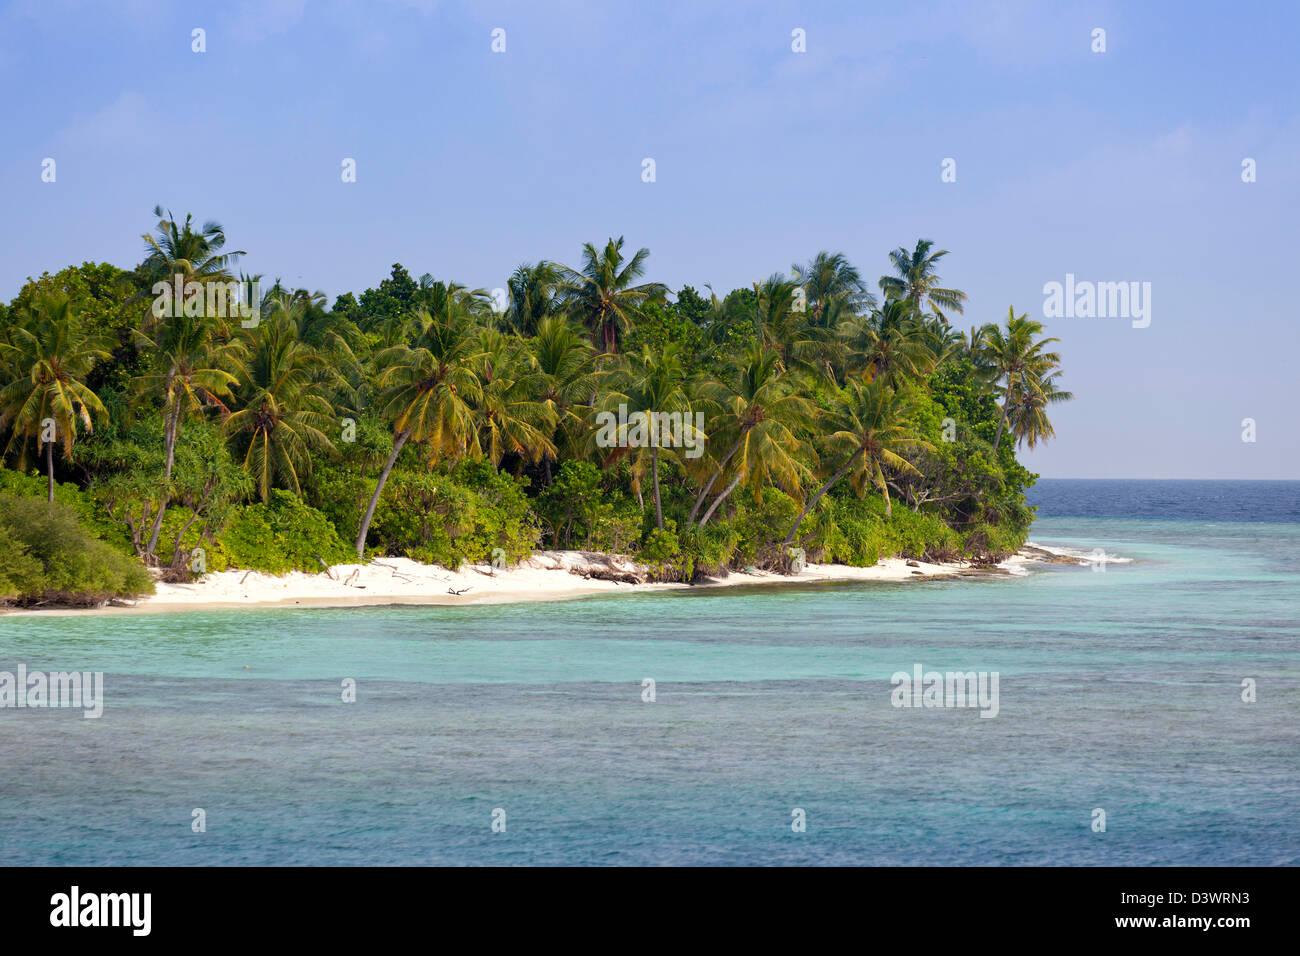 Desert Island, Ari Atoll, Maldives - Stock Image